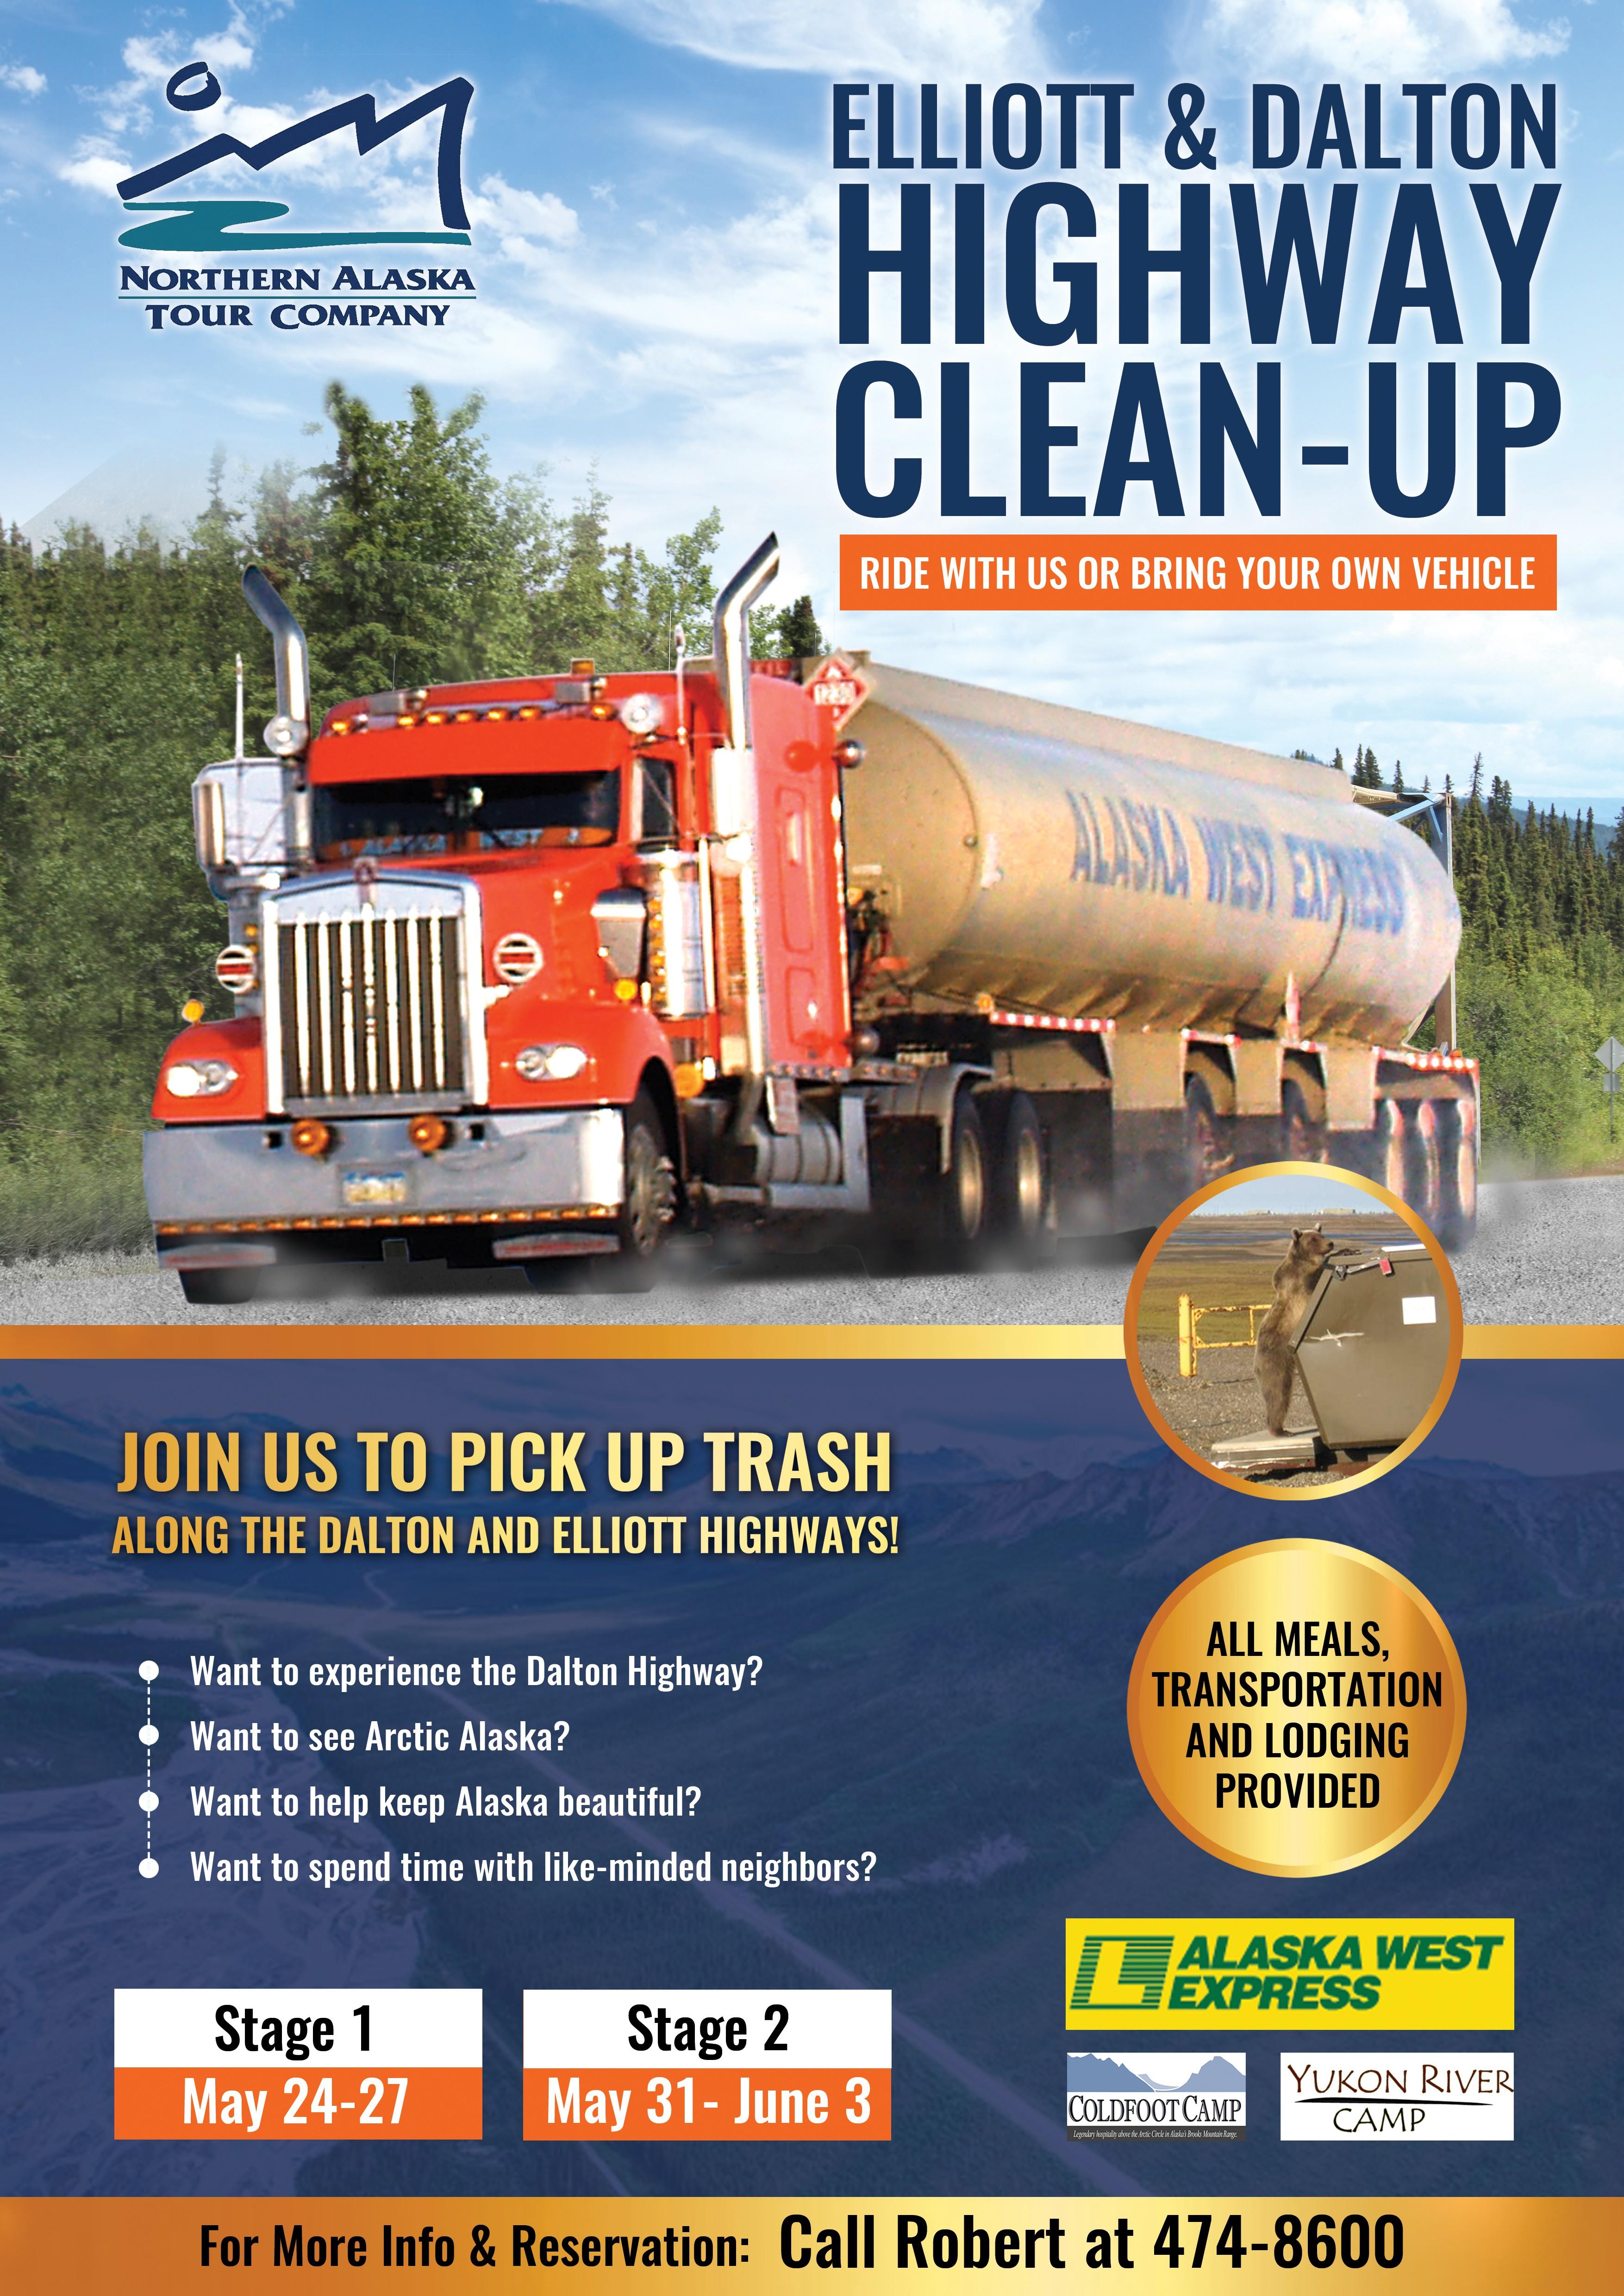 Dalton Highway Clean-Up